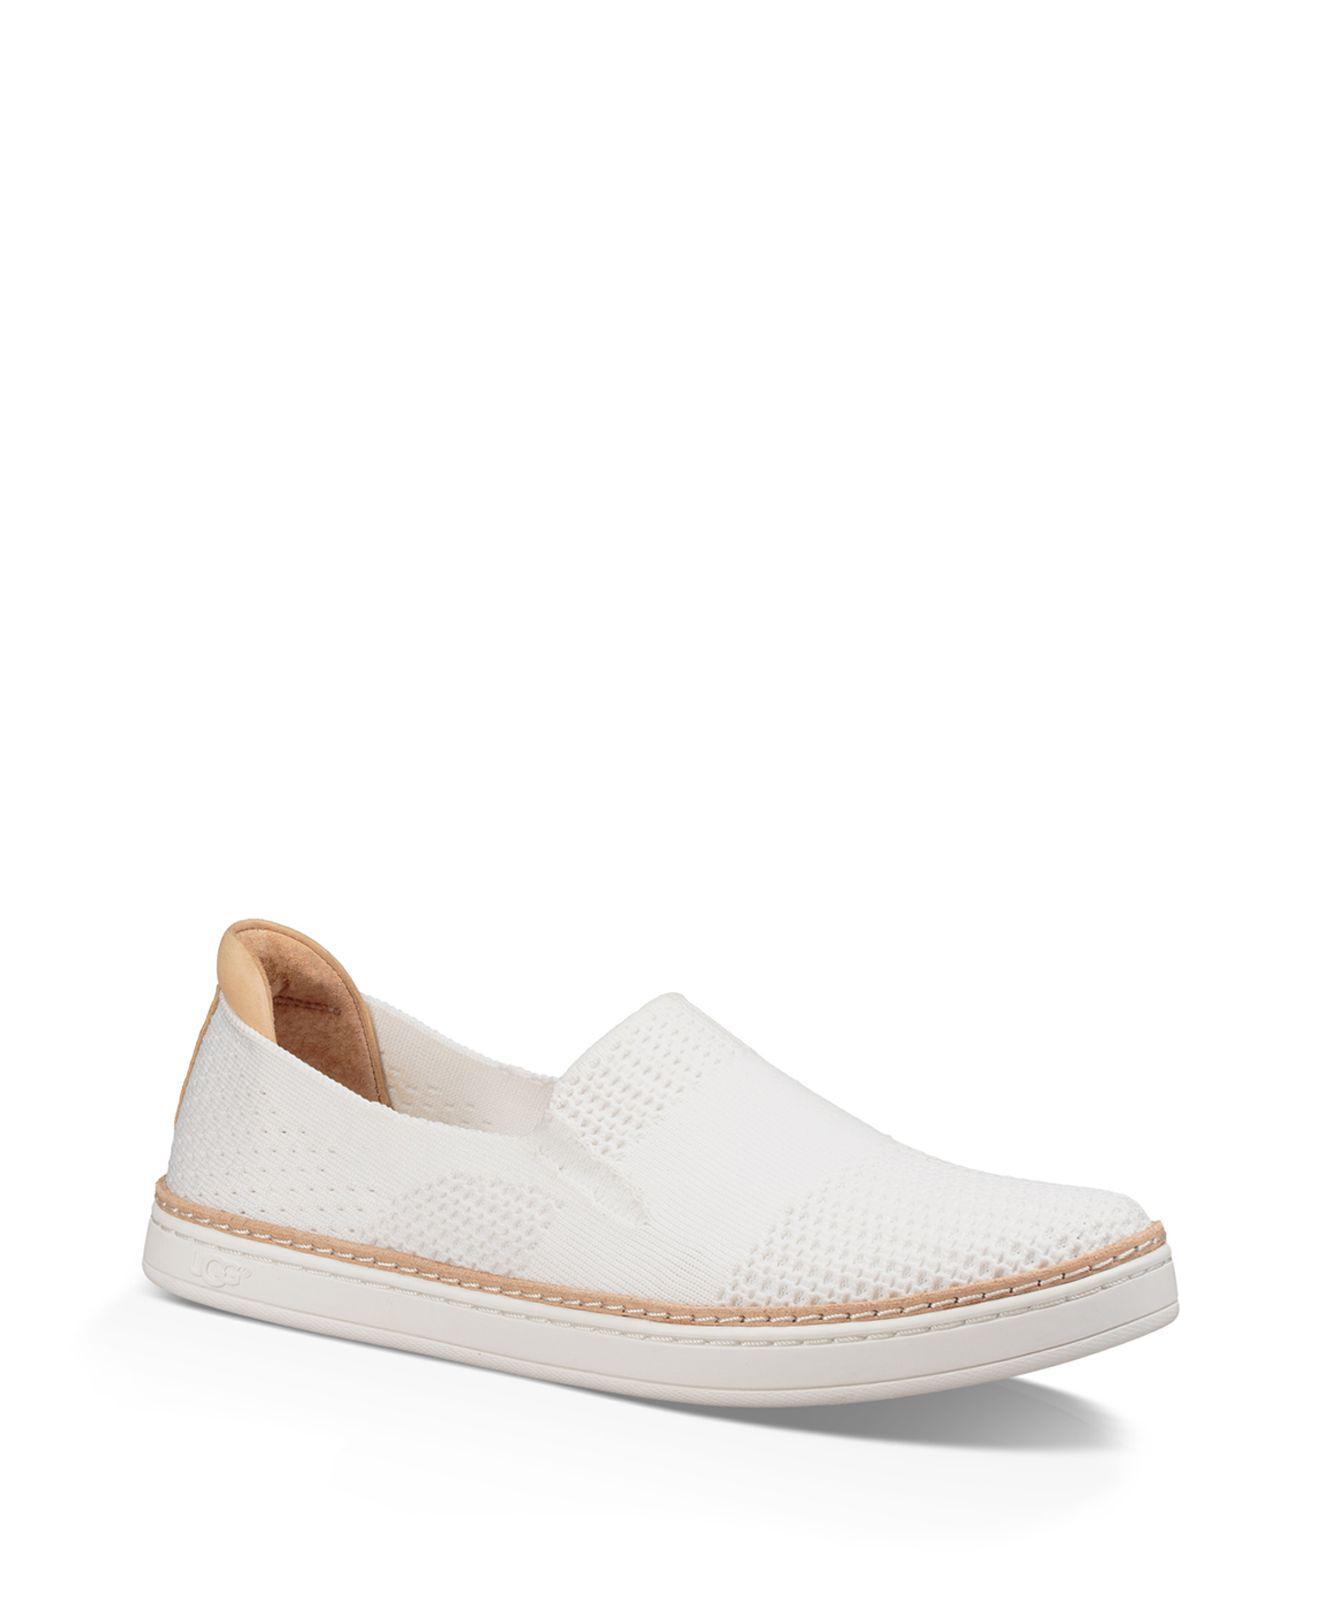 Sammy Heathered Slip-On Sneakers WalsJ